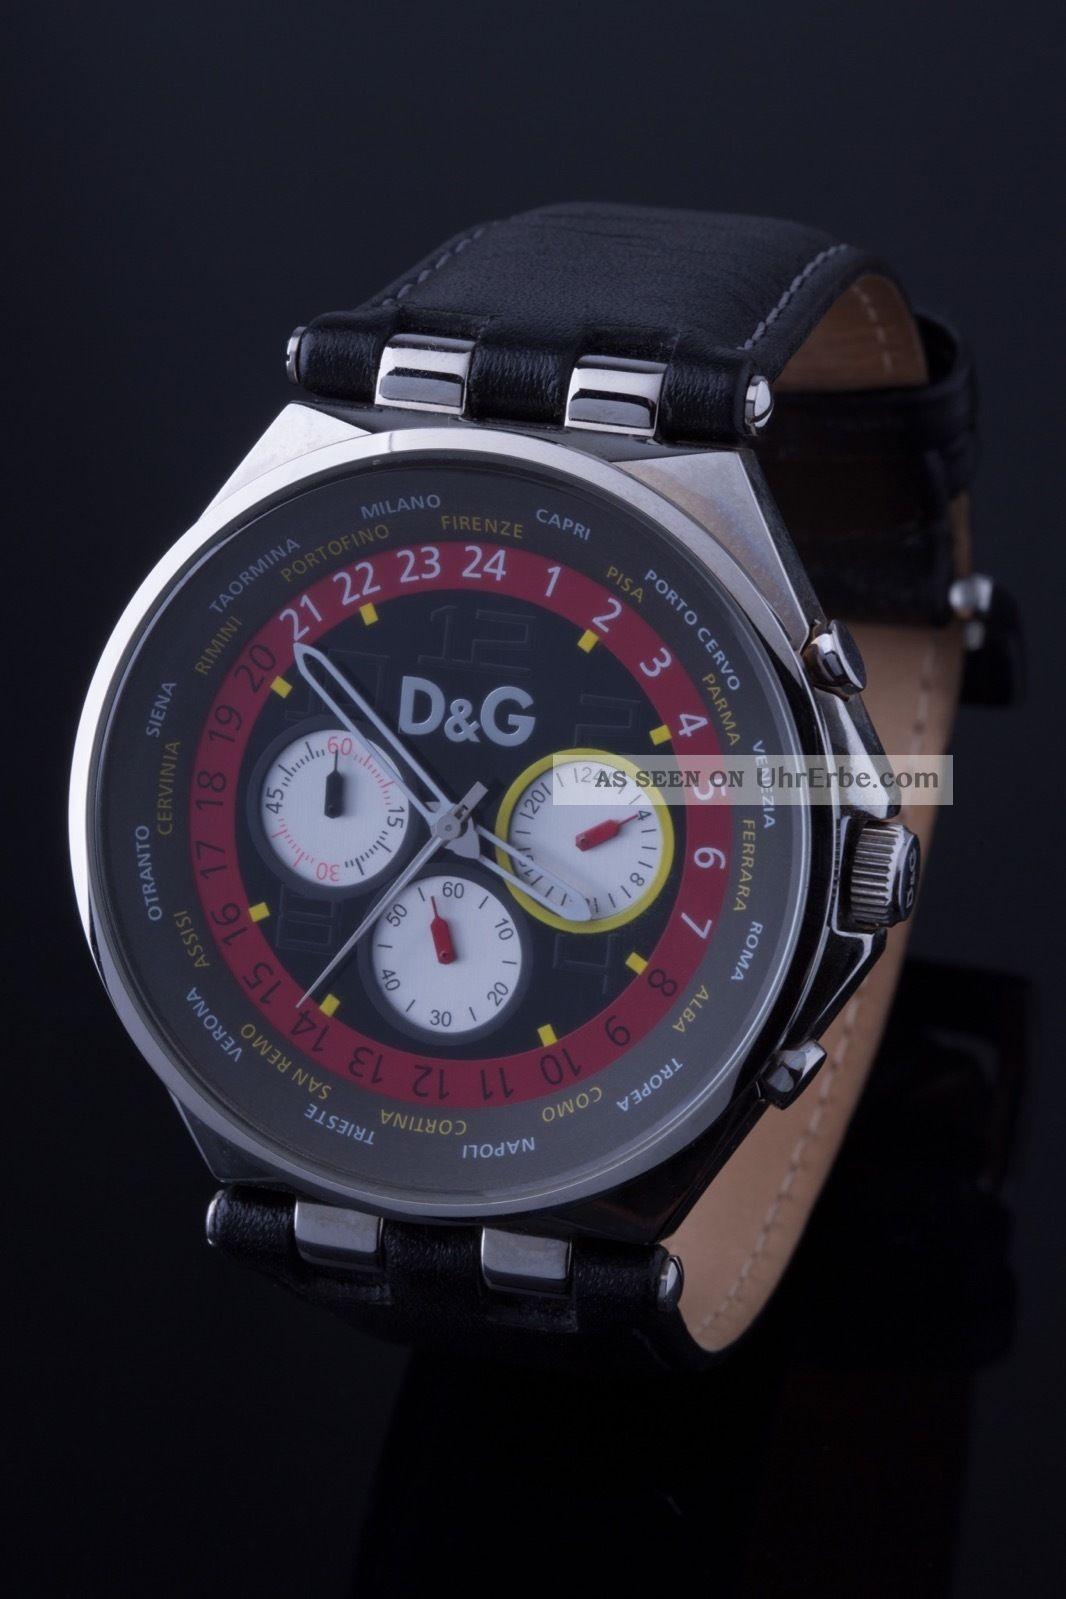 D&g - Dolce Gabbana Quarz Uhr/chronograph/herrenuhr/armbanduhr Armbanduhren Bild